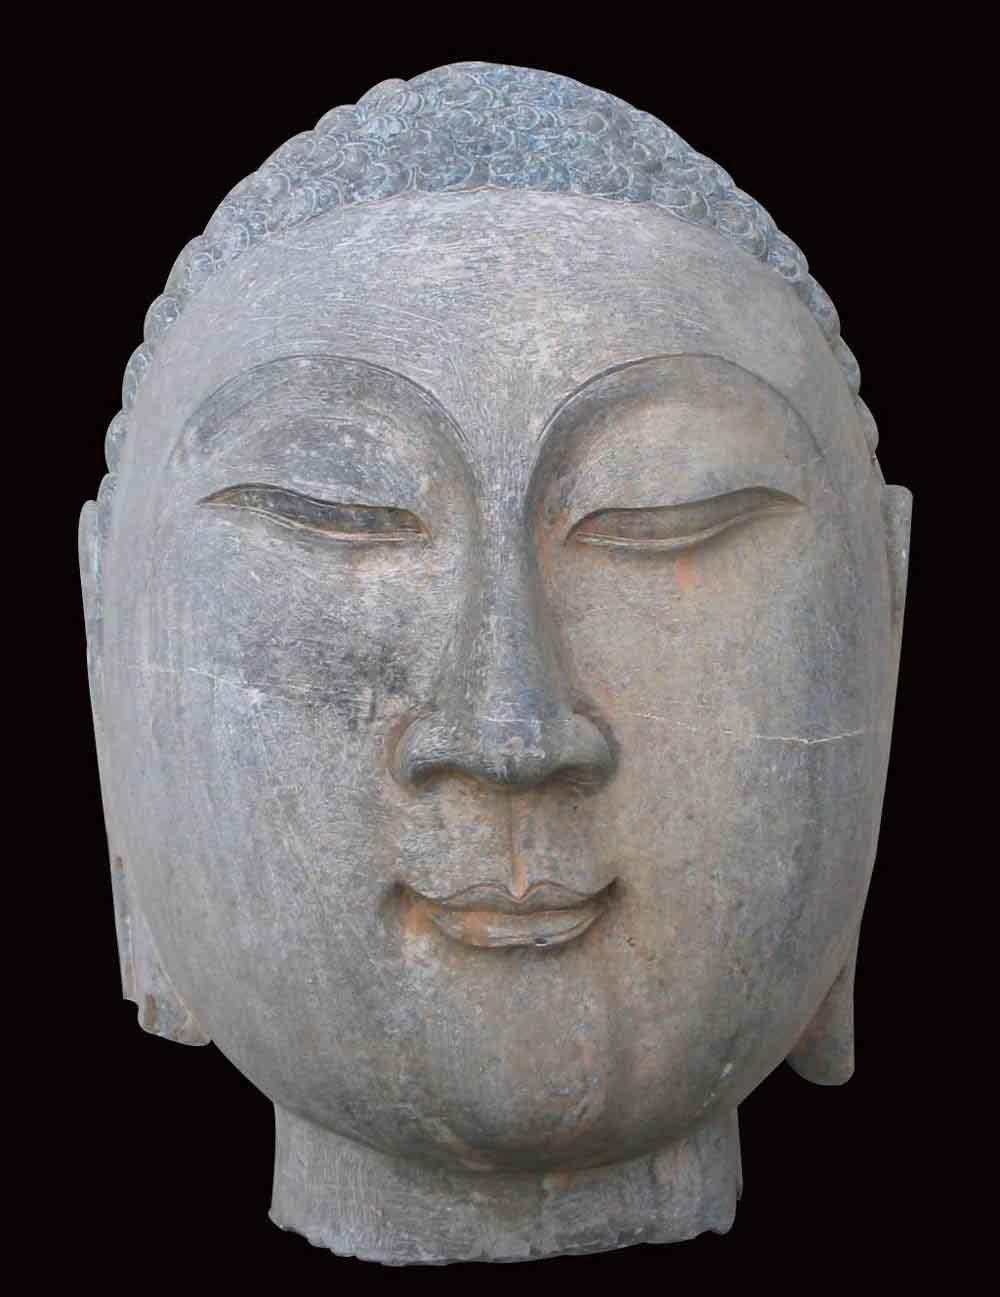 China stone carving buddha head sculpture